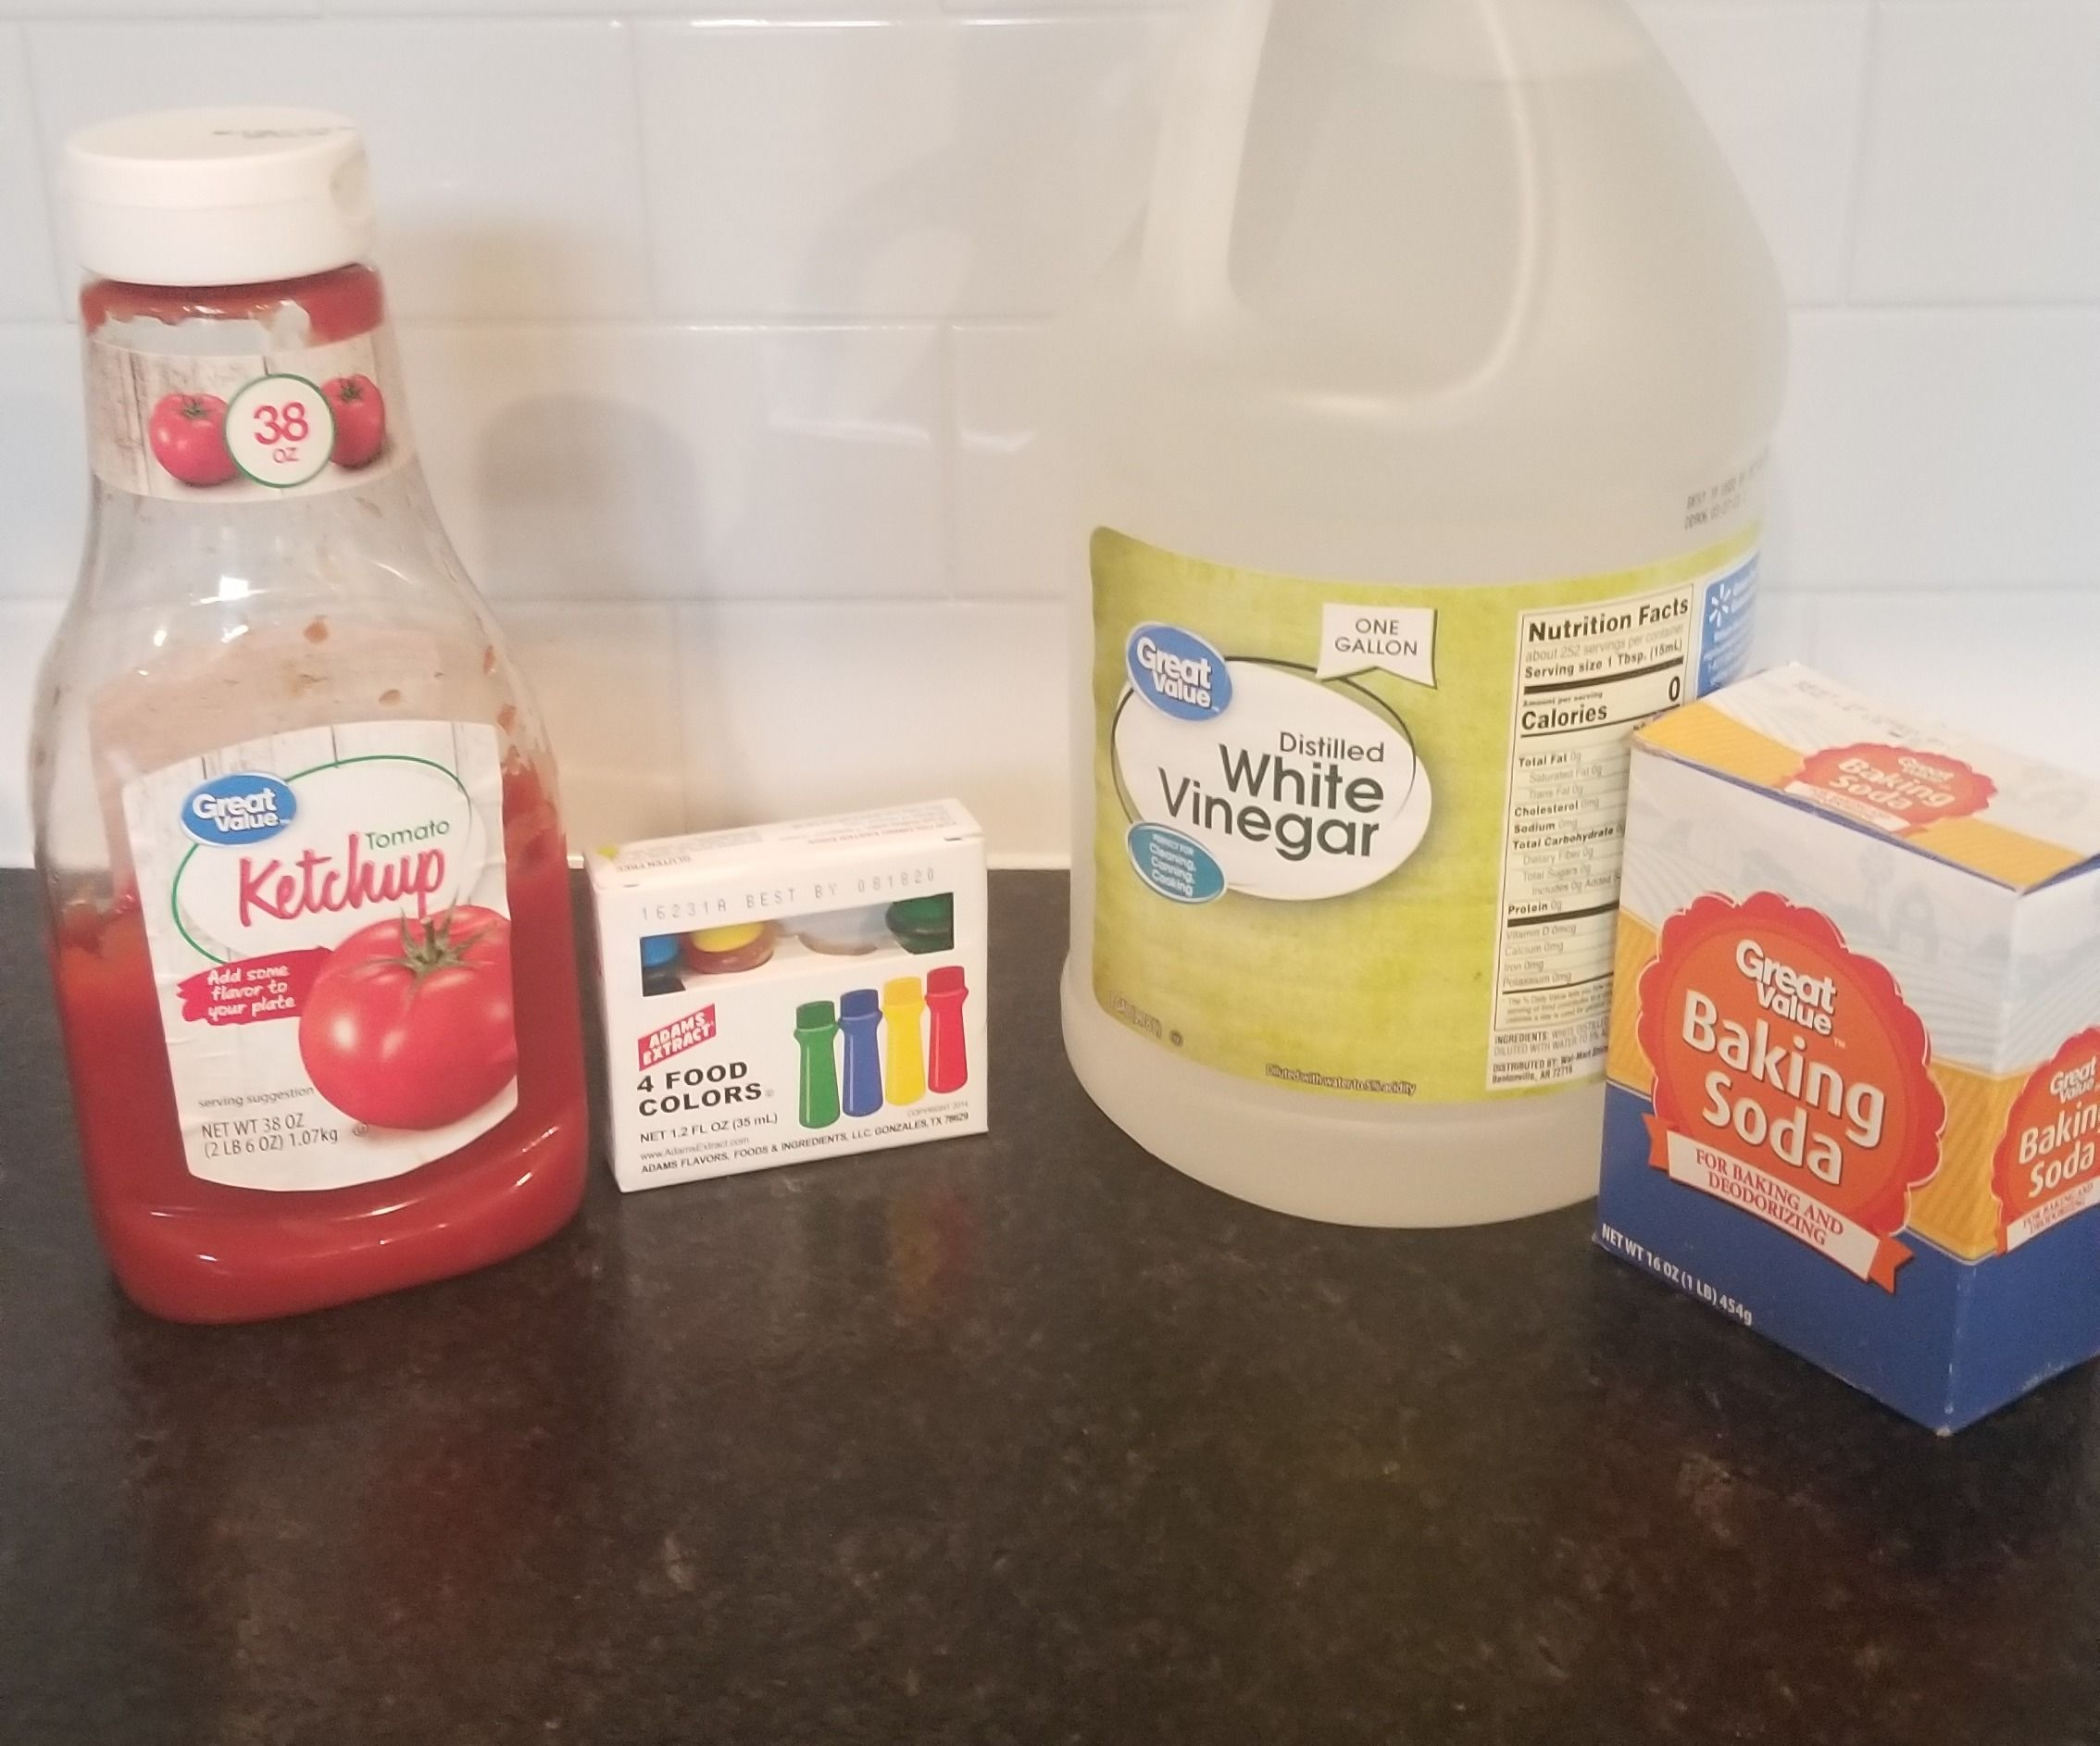 Do Ketchup and Food Coloring Mix?